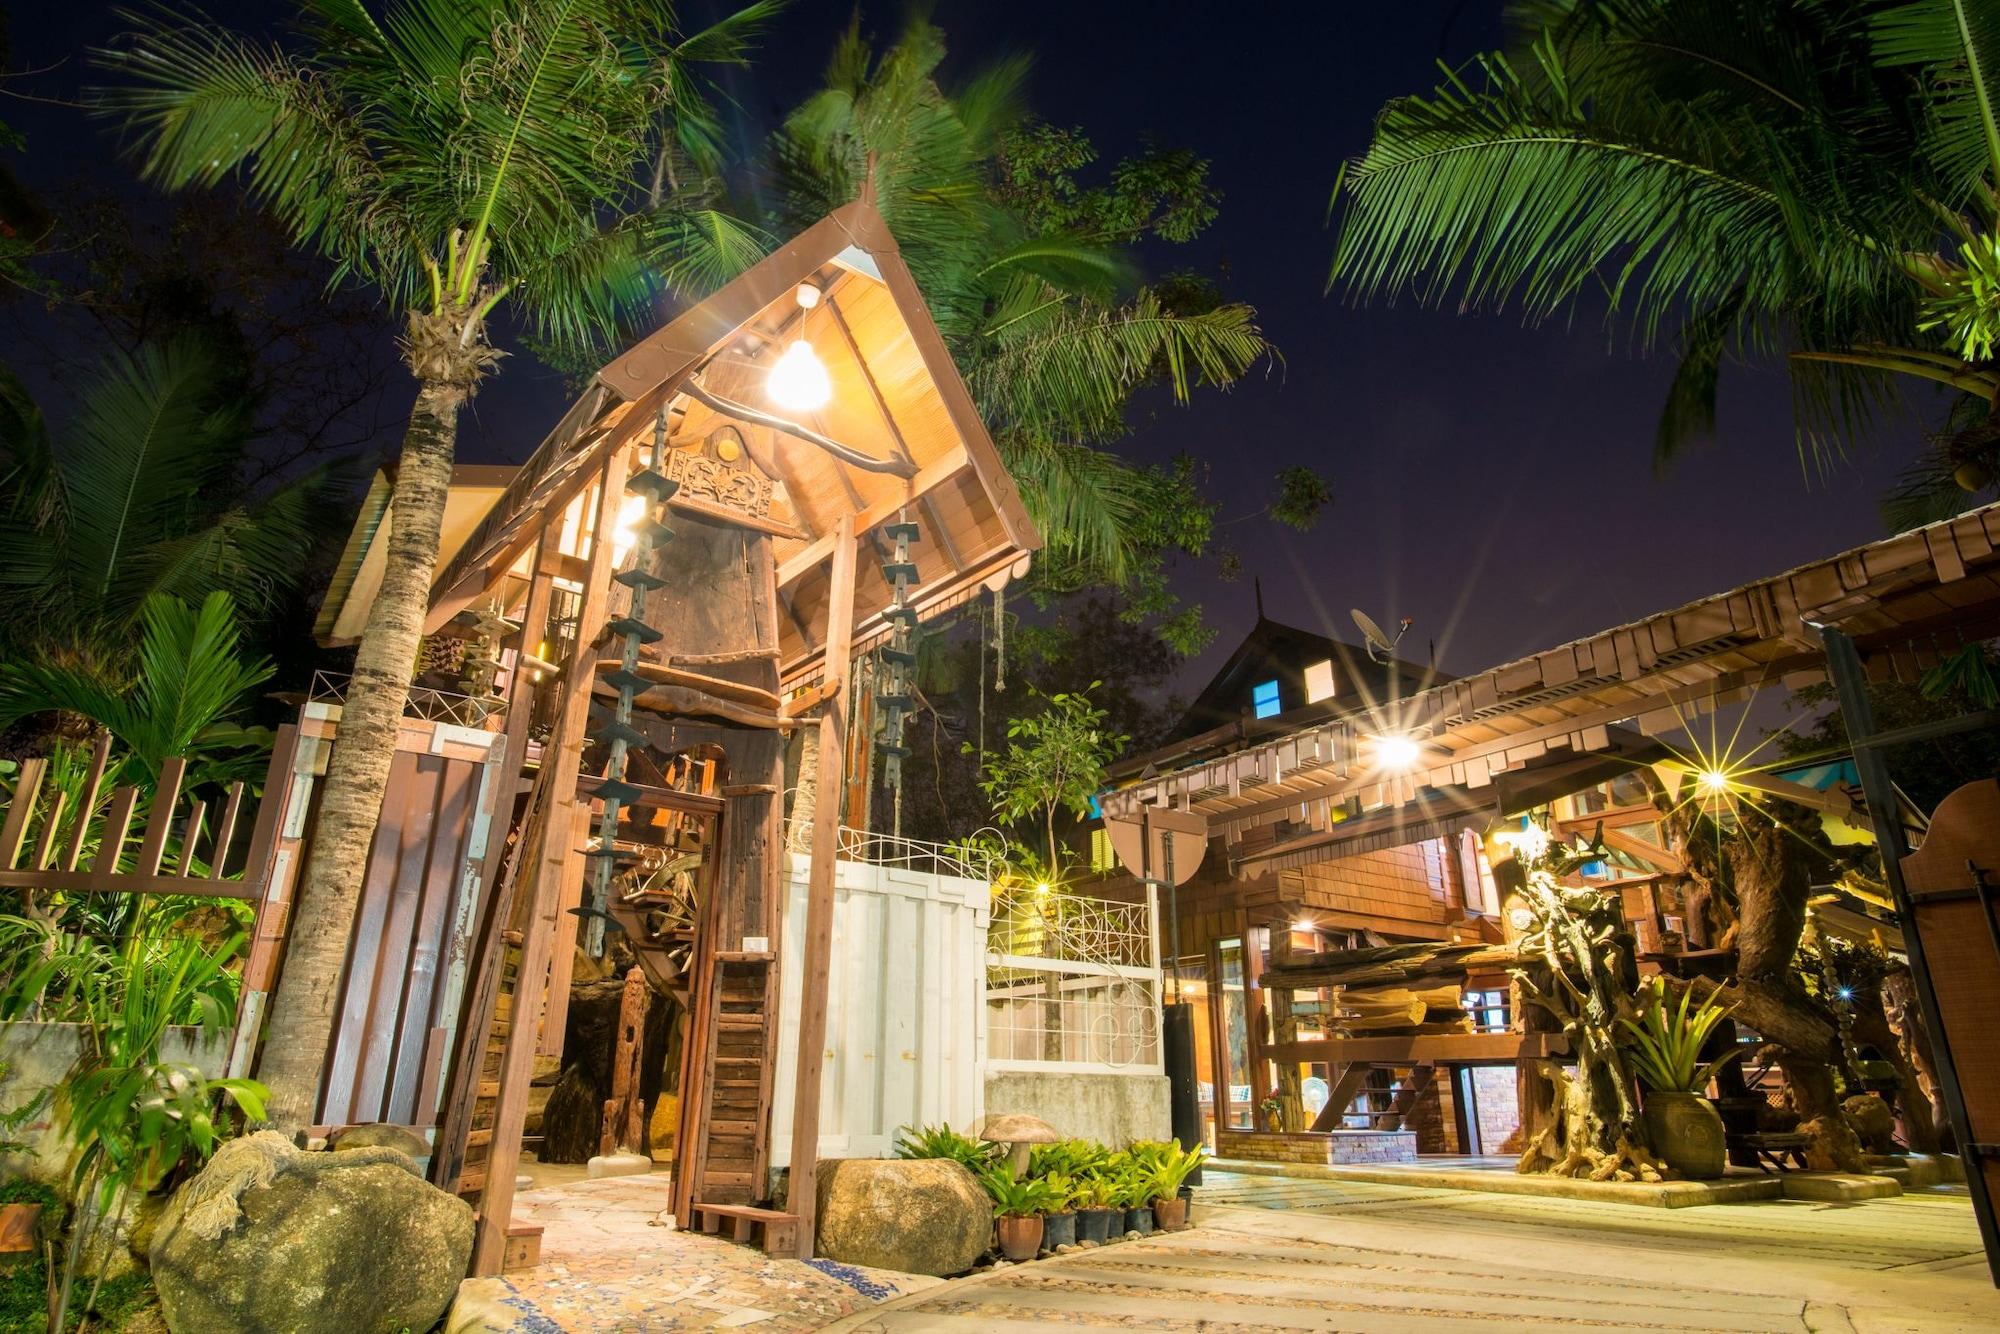 Suankaew Art Cottage, Si Racha